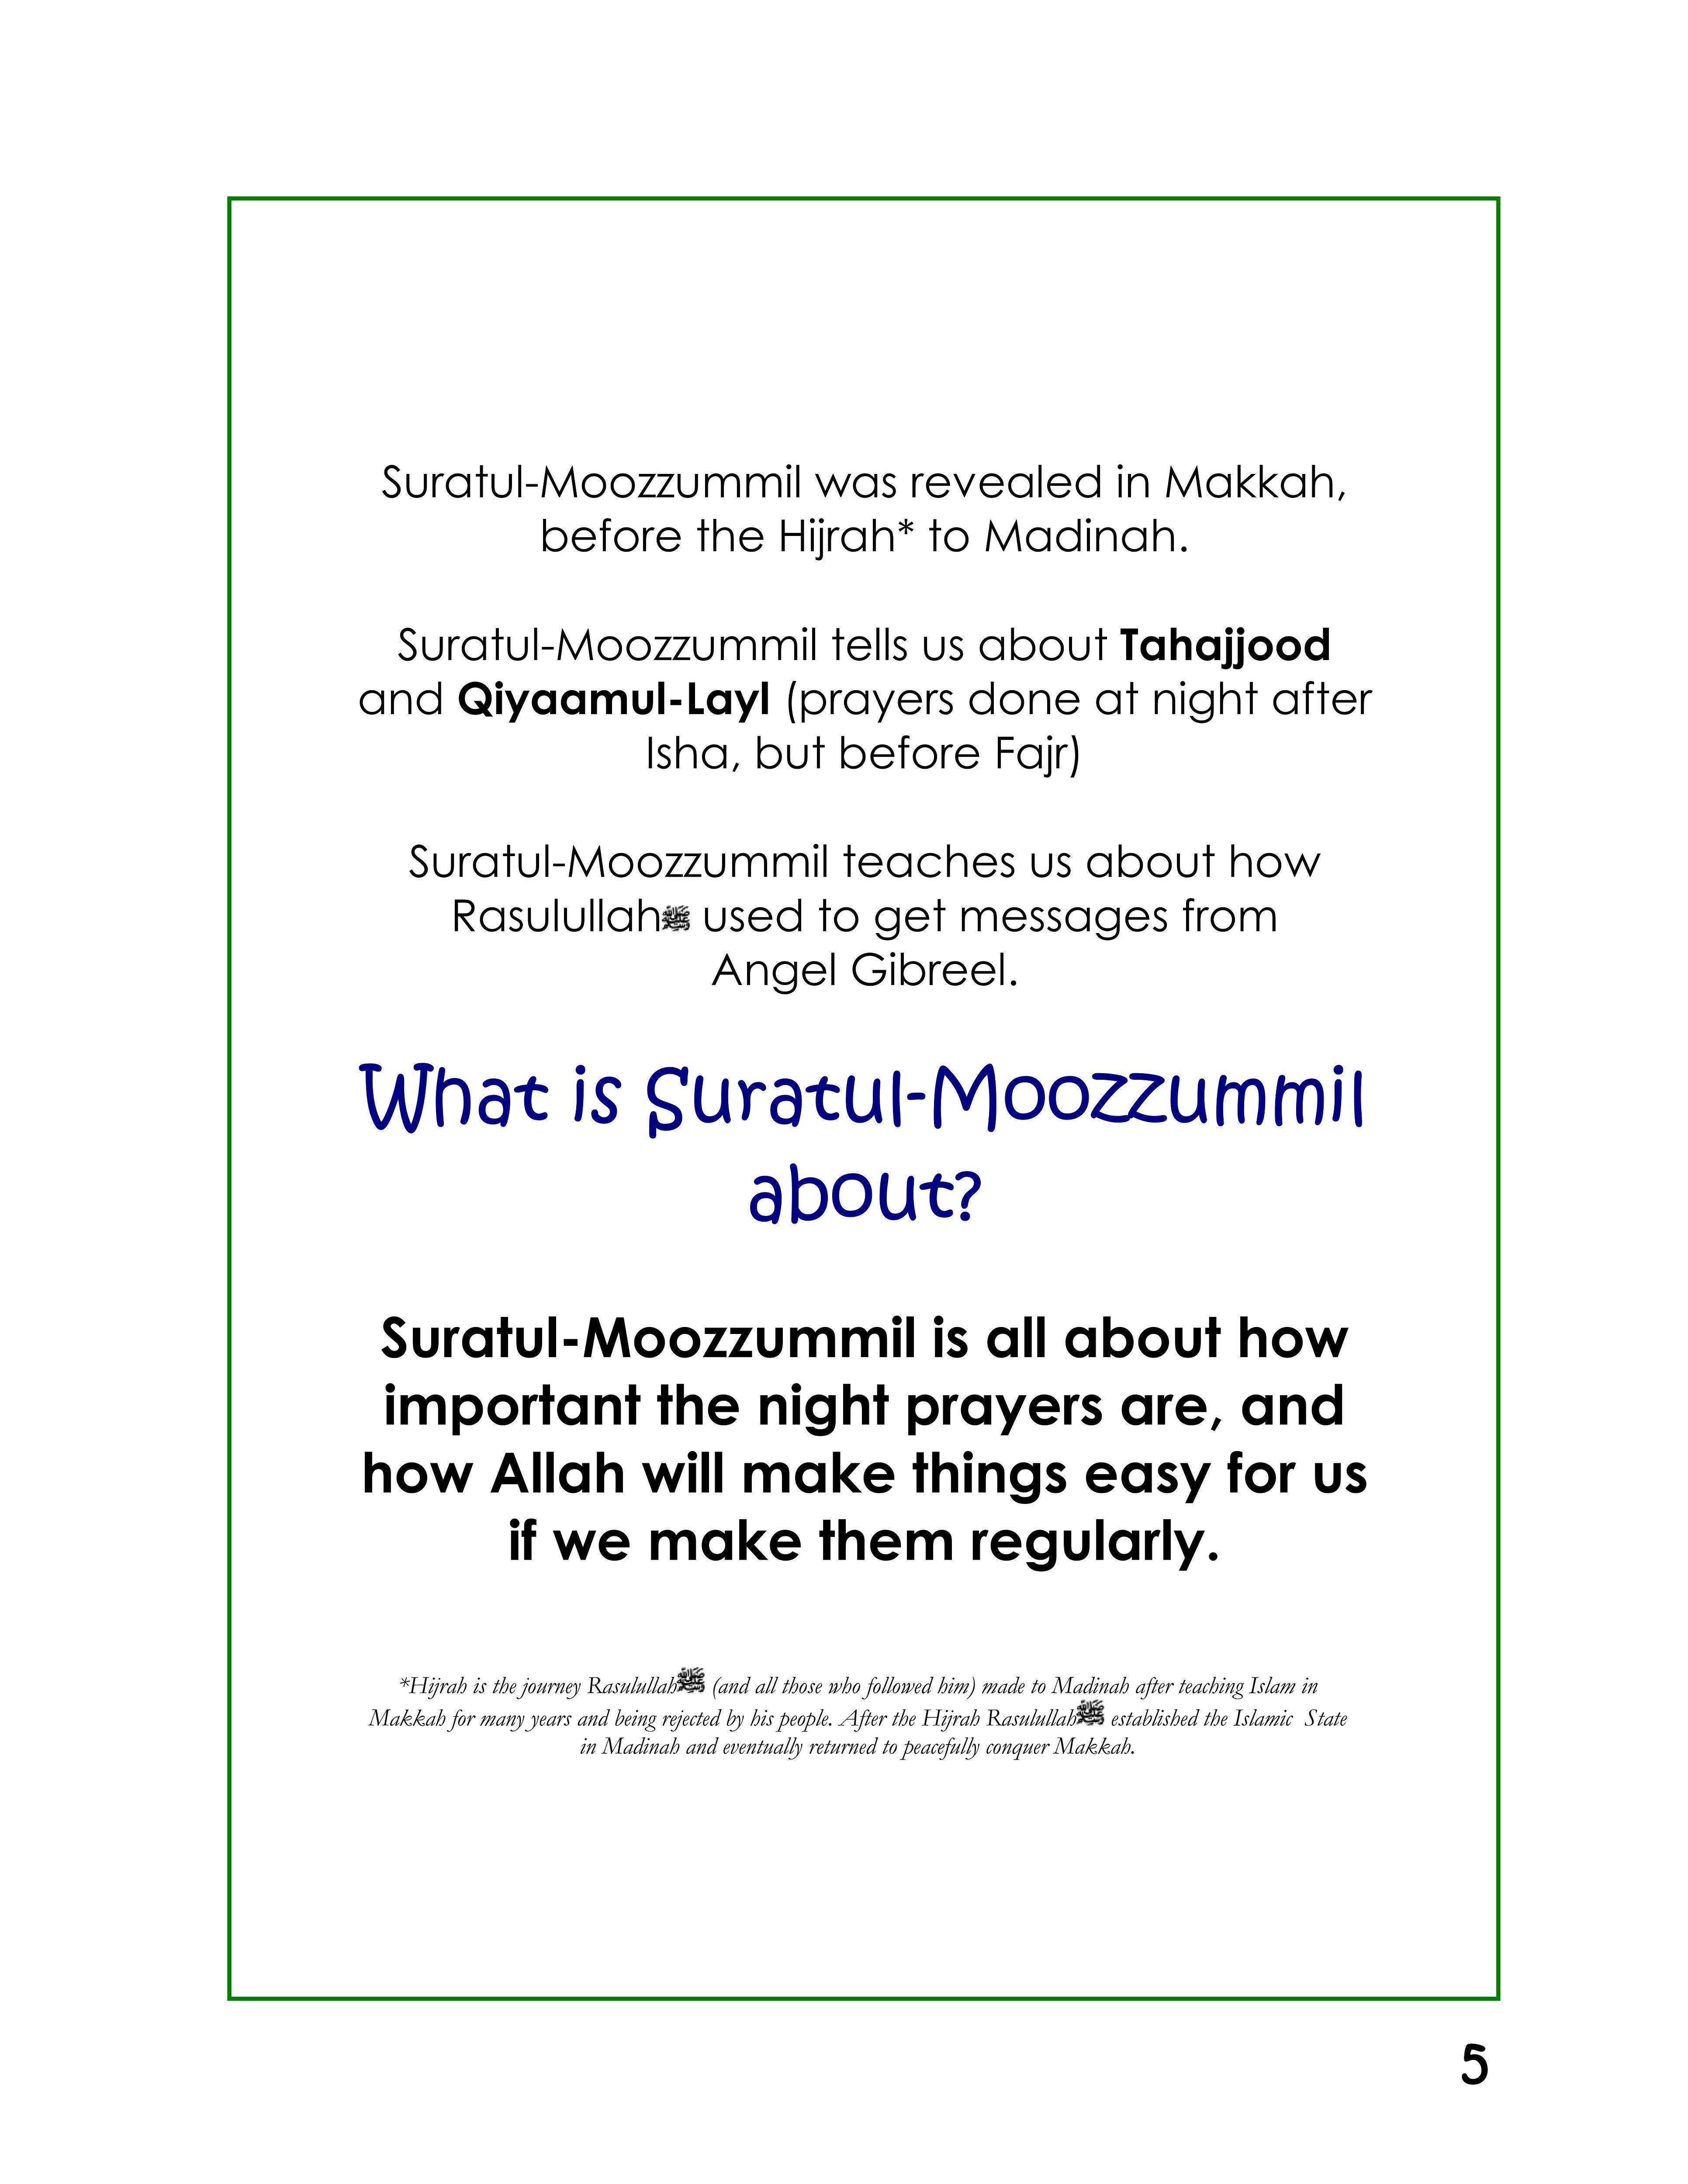 A Child's Tafseer: Suratul-Moozzummil (e-Book)